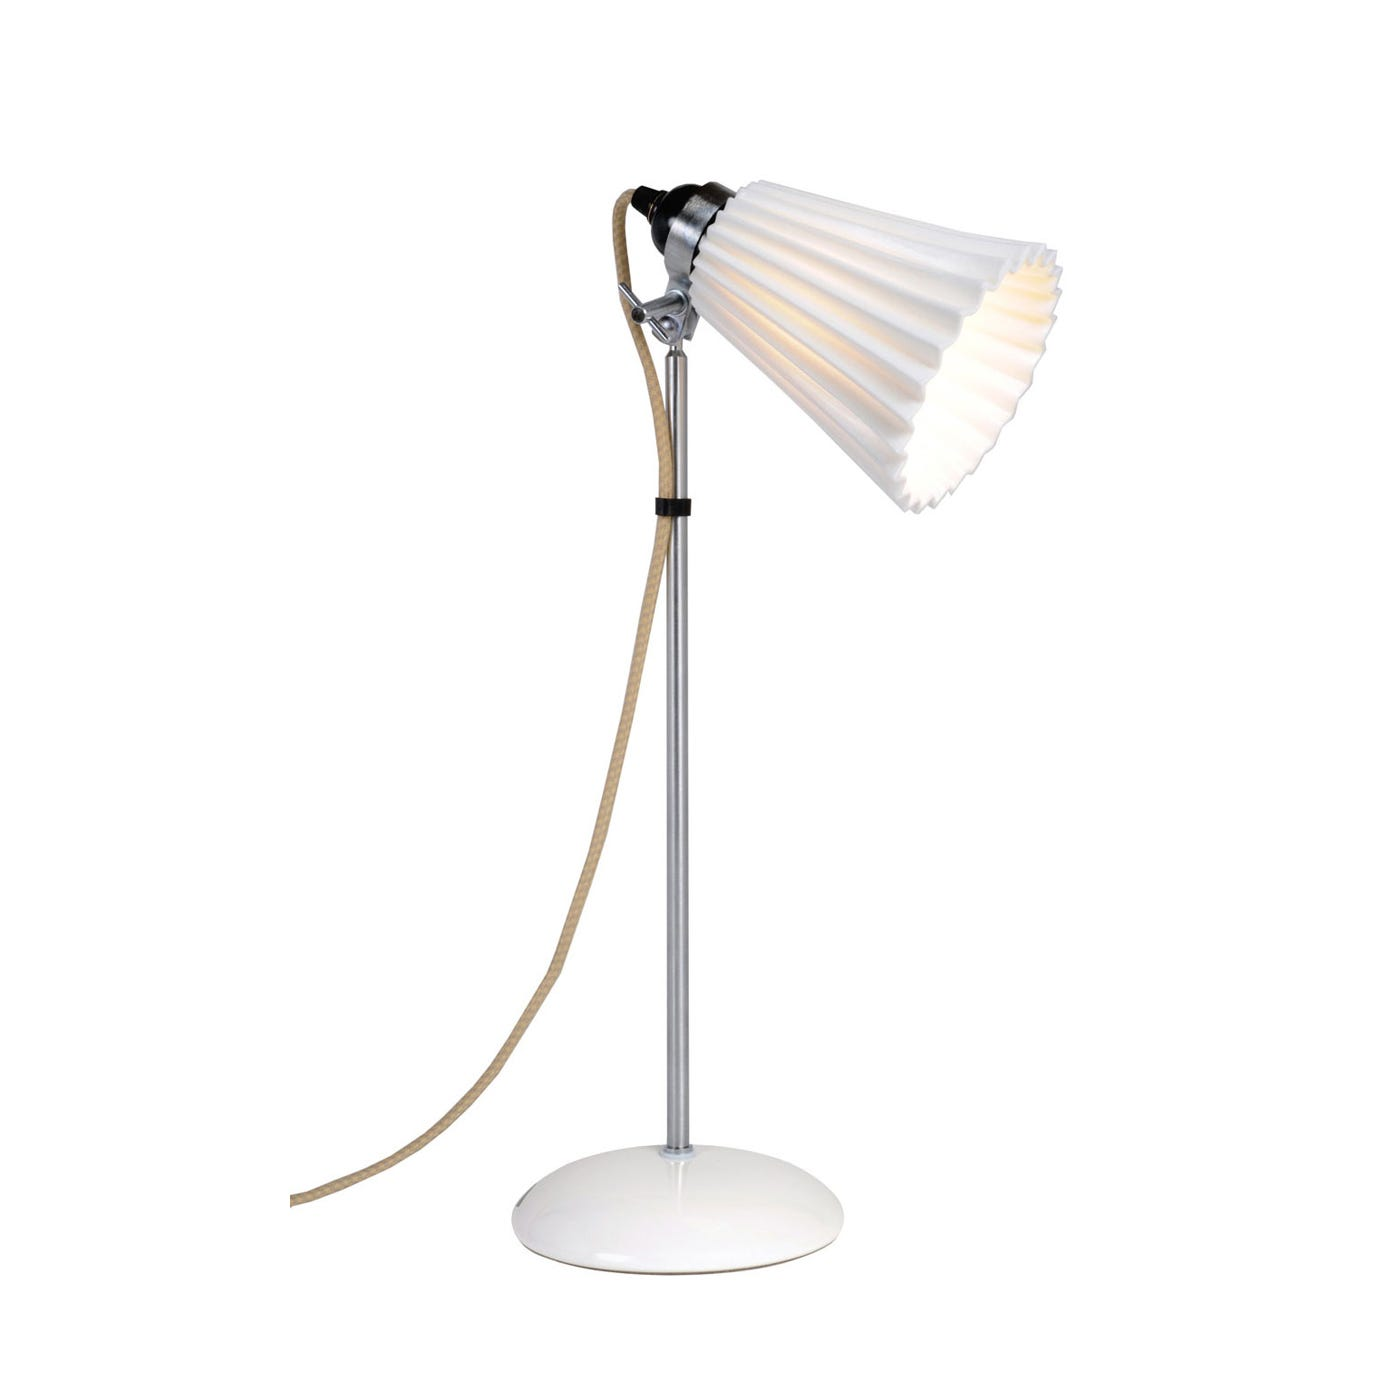 Original btc hector pleated table lamp heals hector pleated table lamp aloadofball Image collections